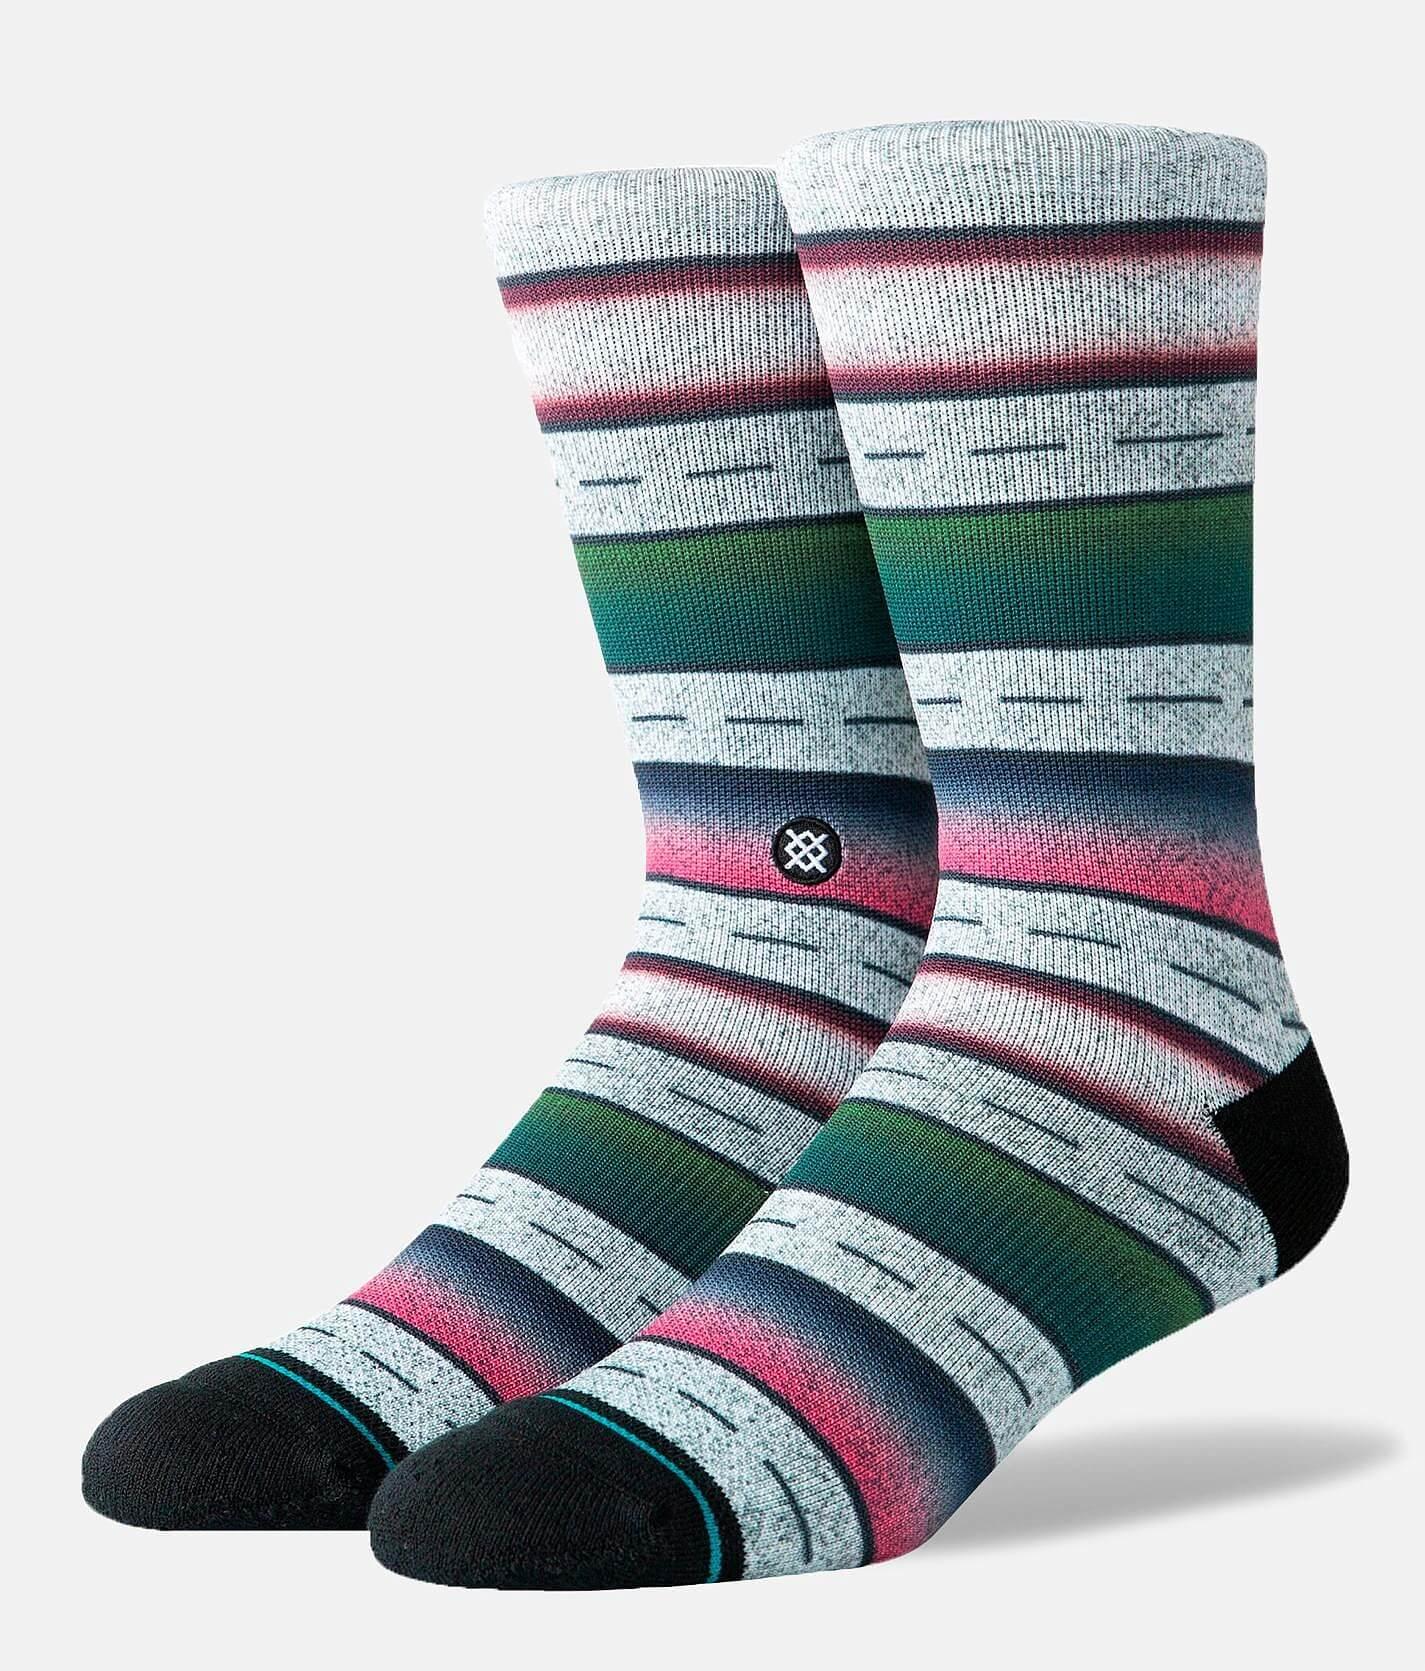 Stance Leslee Crew Socks in Grey